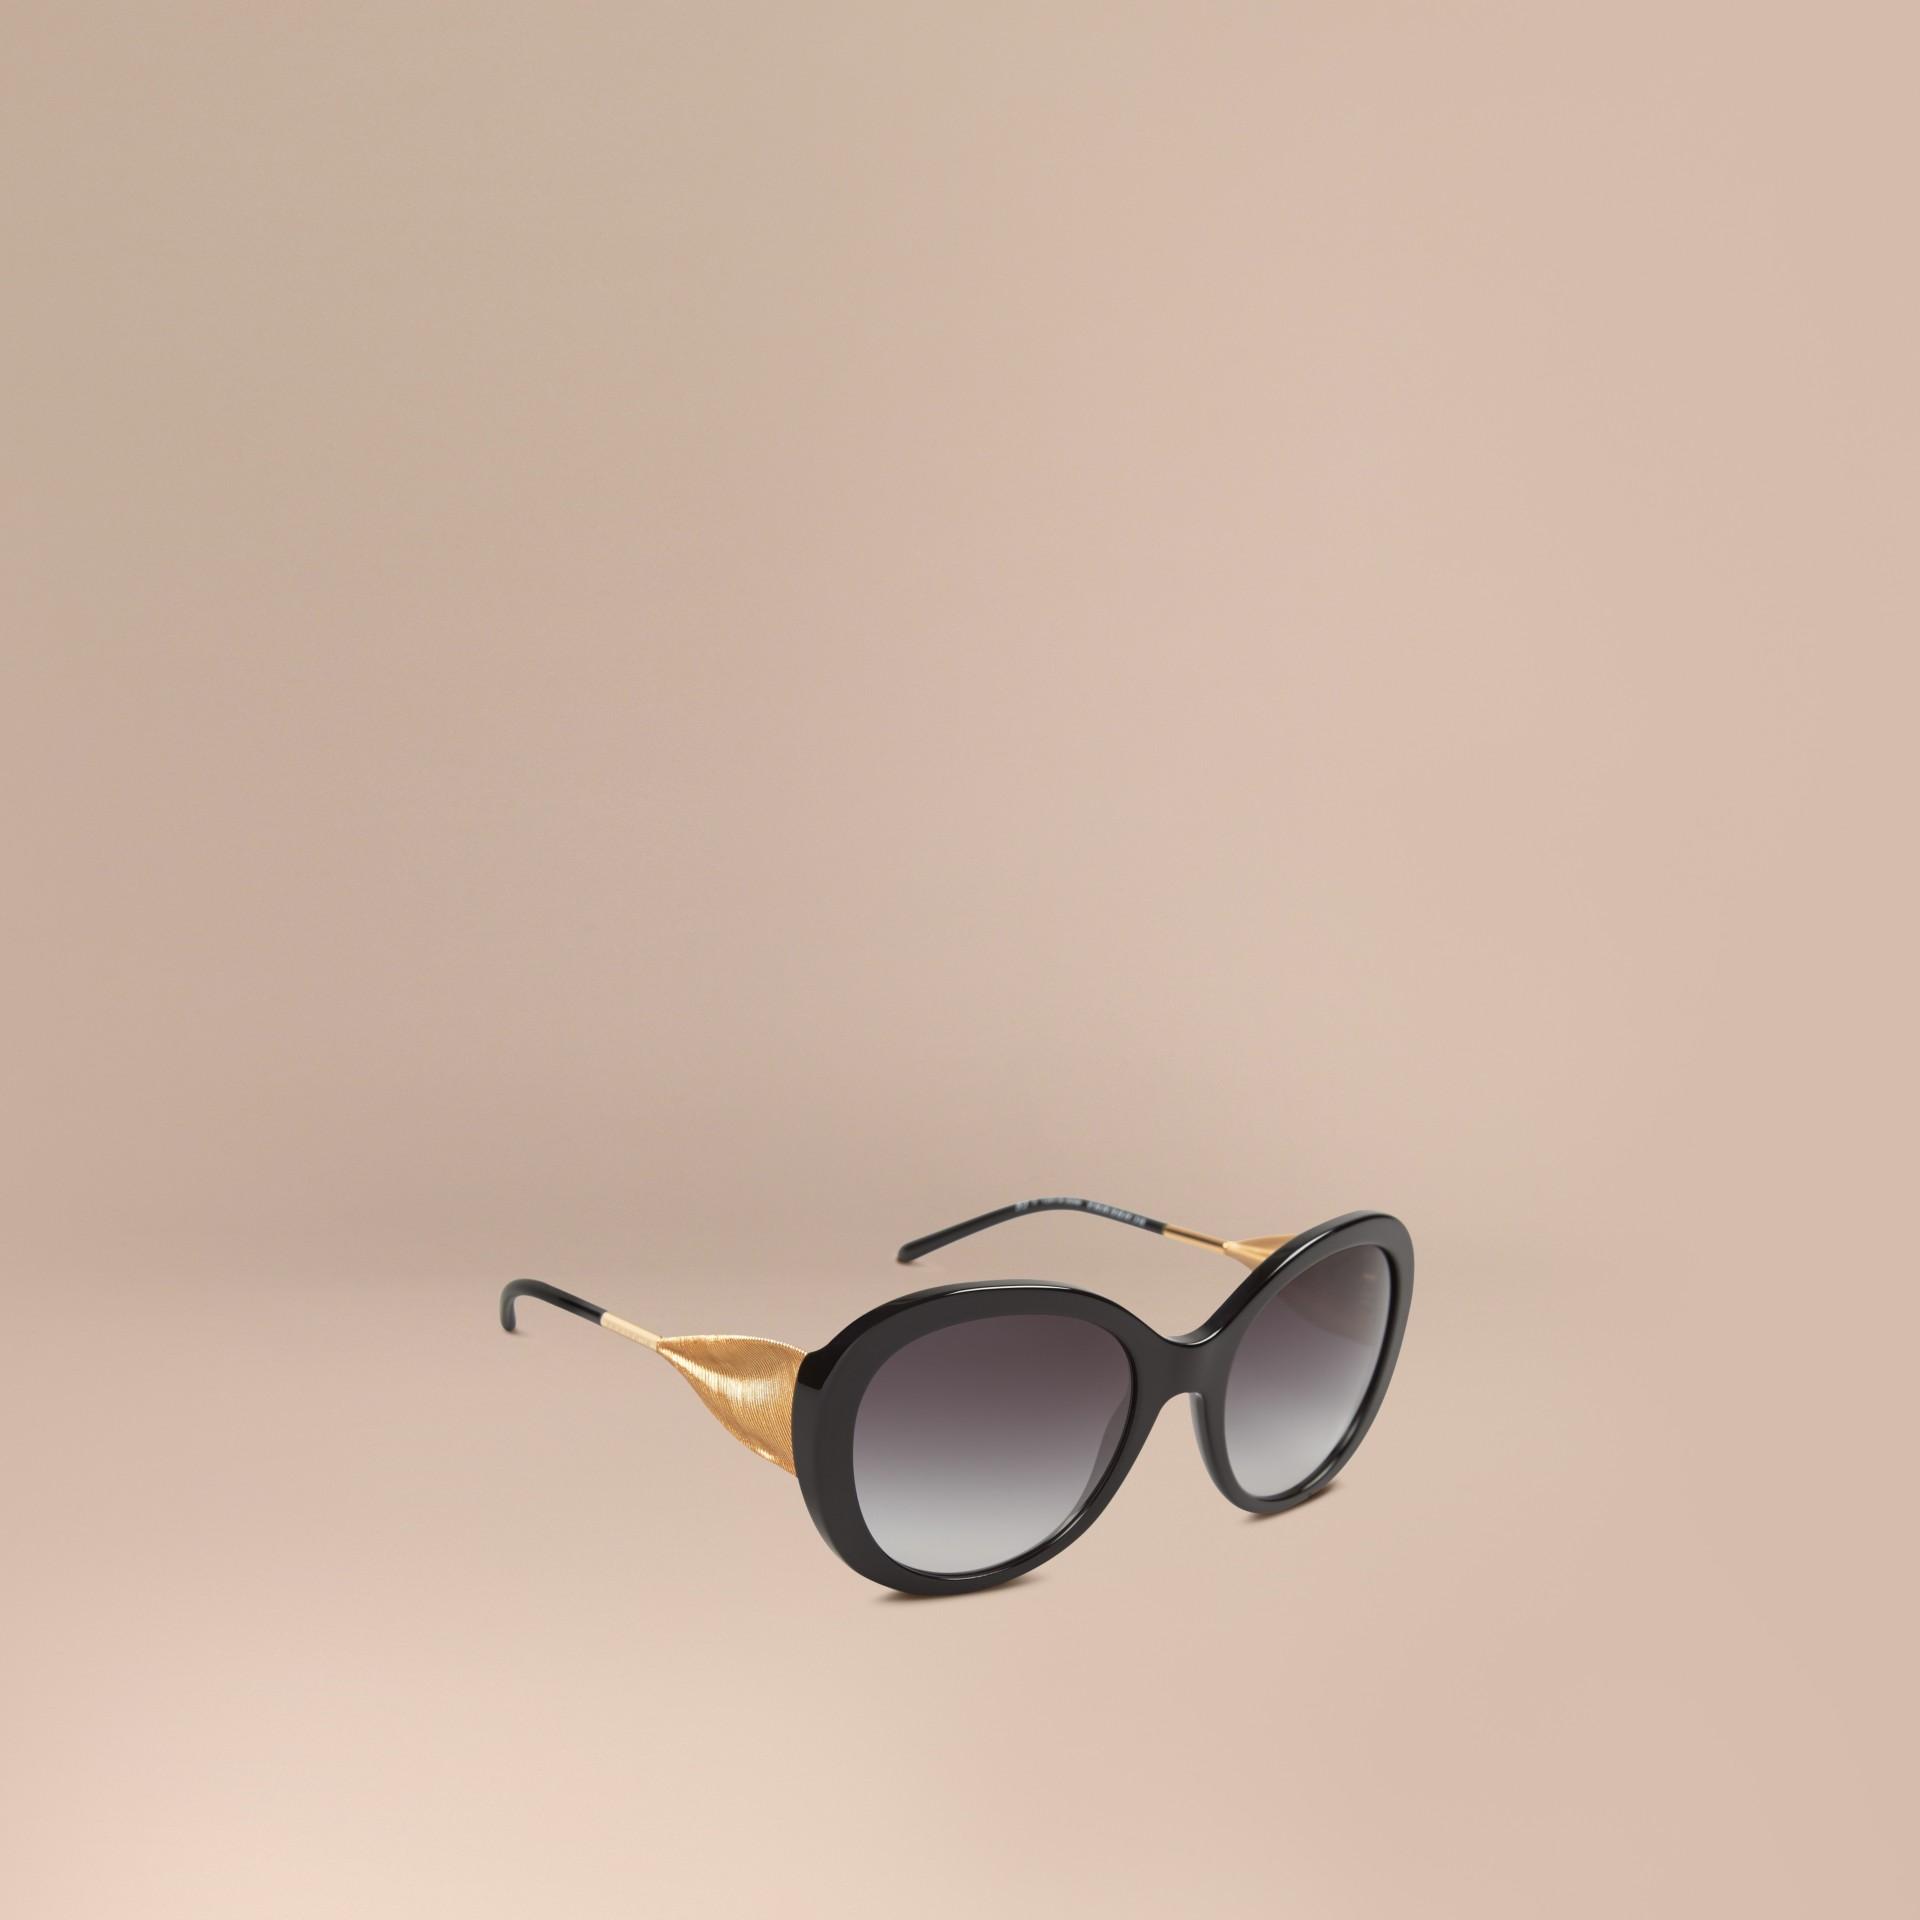 Burberry Black Frame Glasses : Gabardine Collection Oversize Round Frame Sunglasses in ...